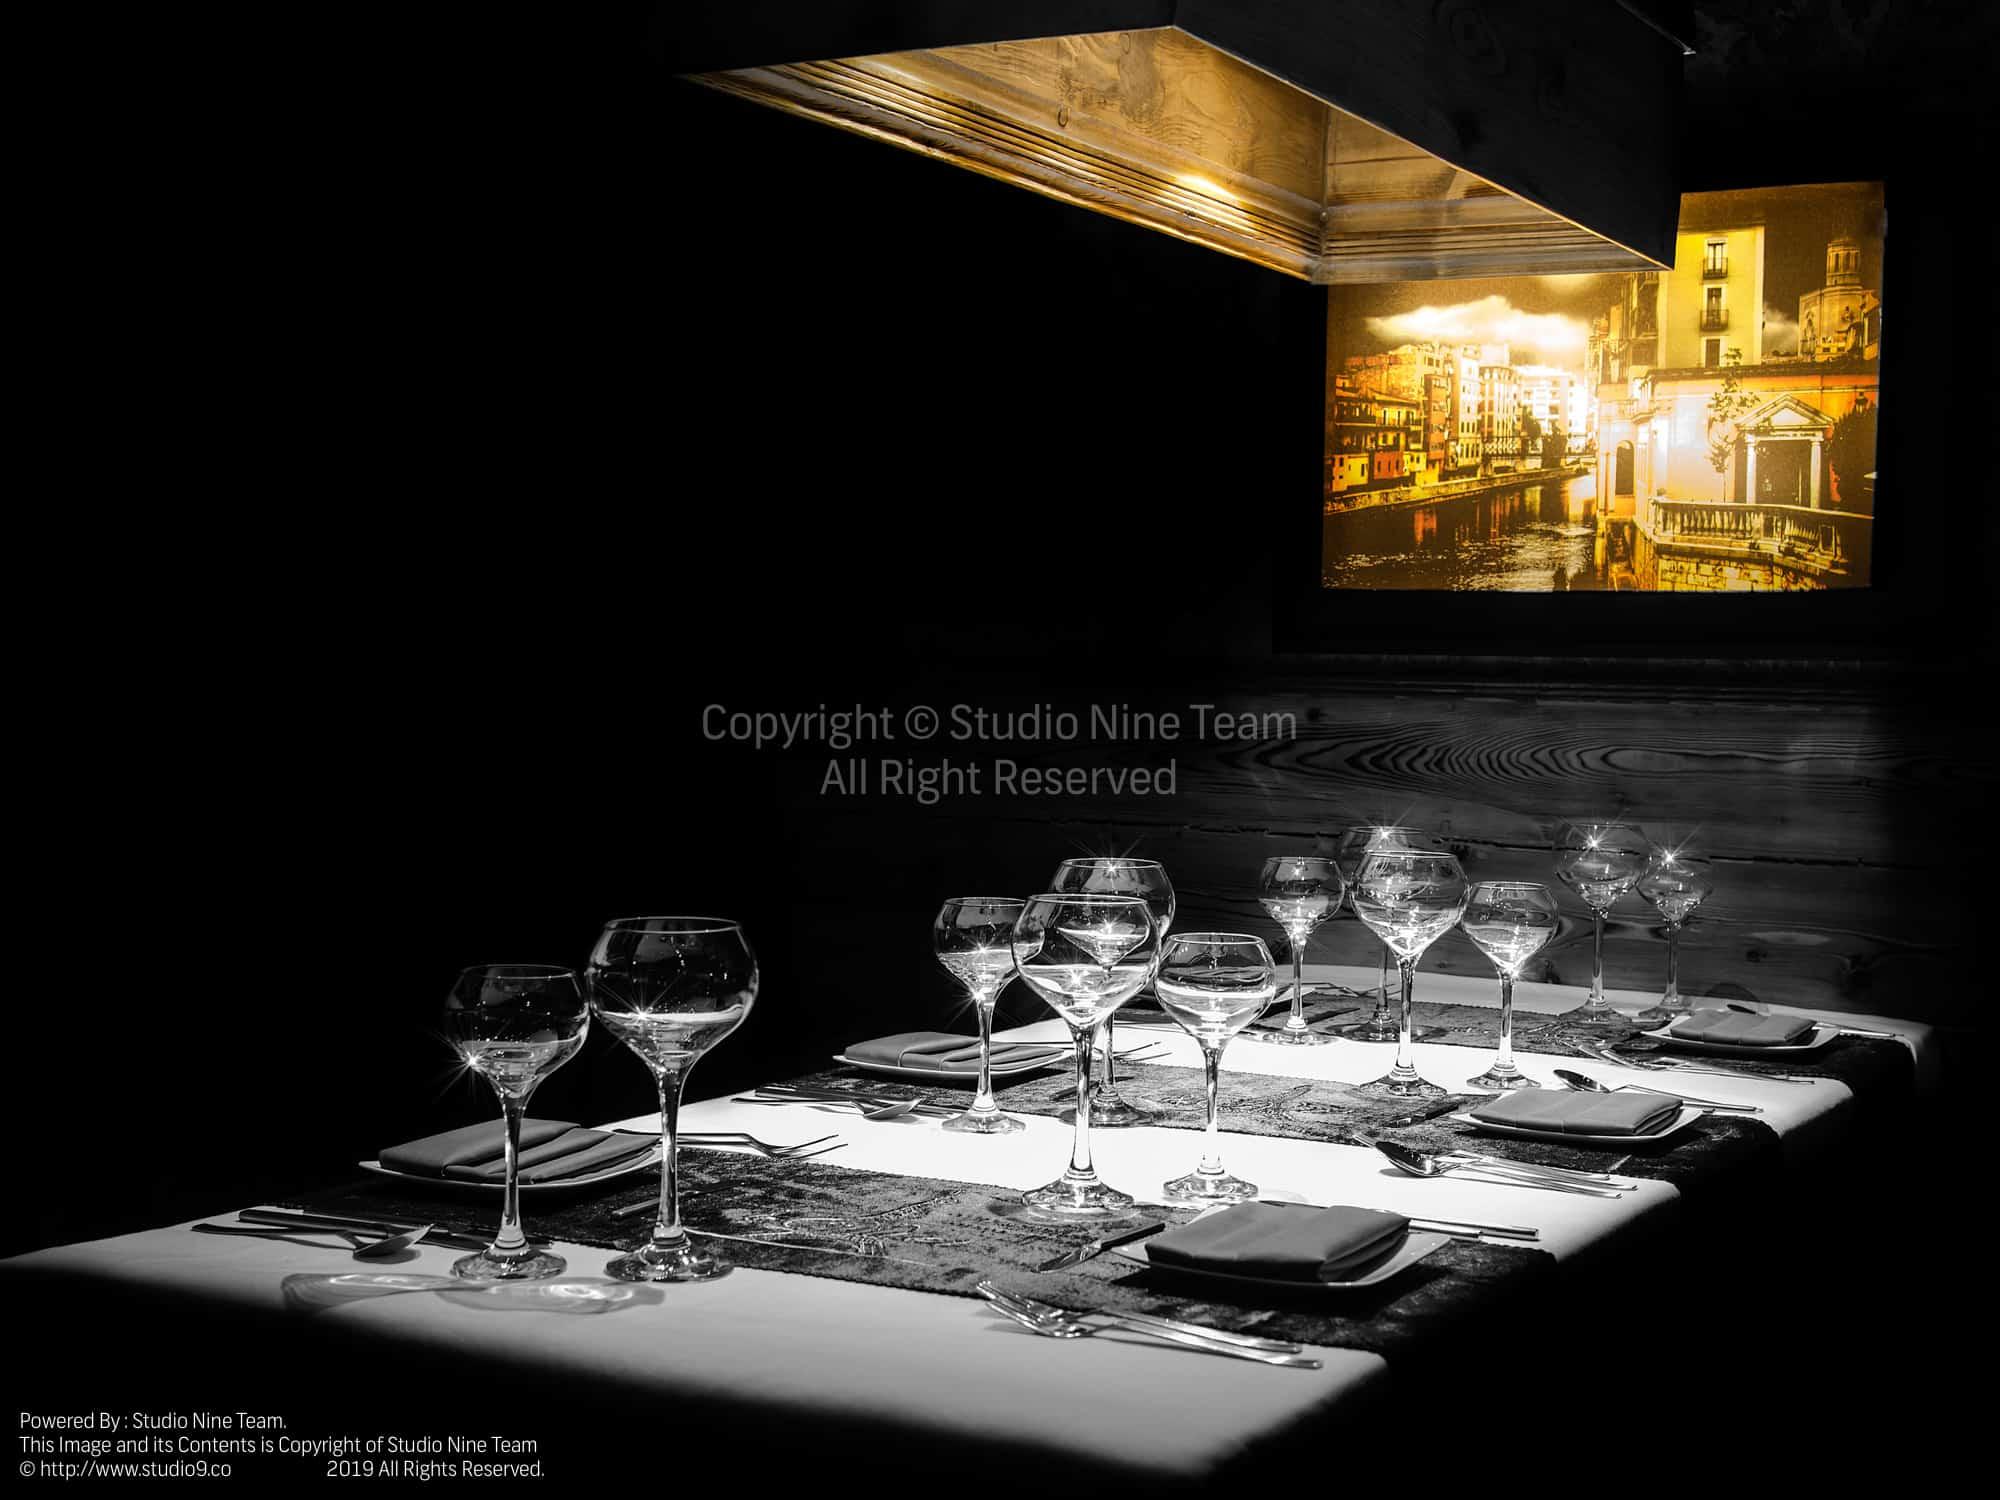 عکاسی دکوراسیون و معماری | عکاسی رستوران | خدمات عکاسی کافه و رستوران